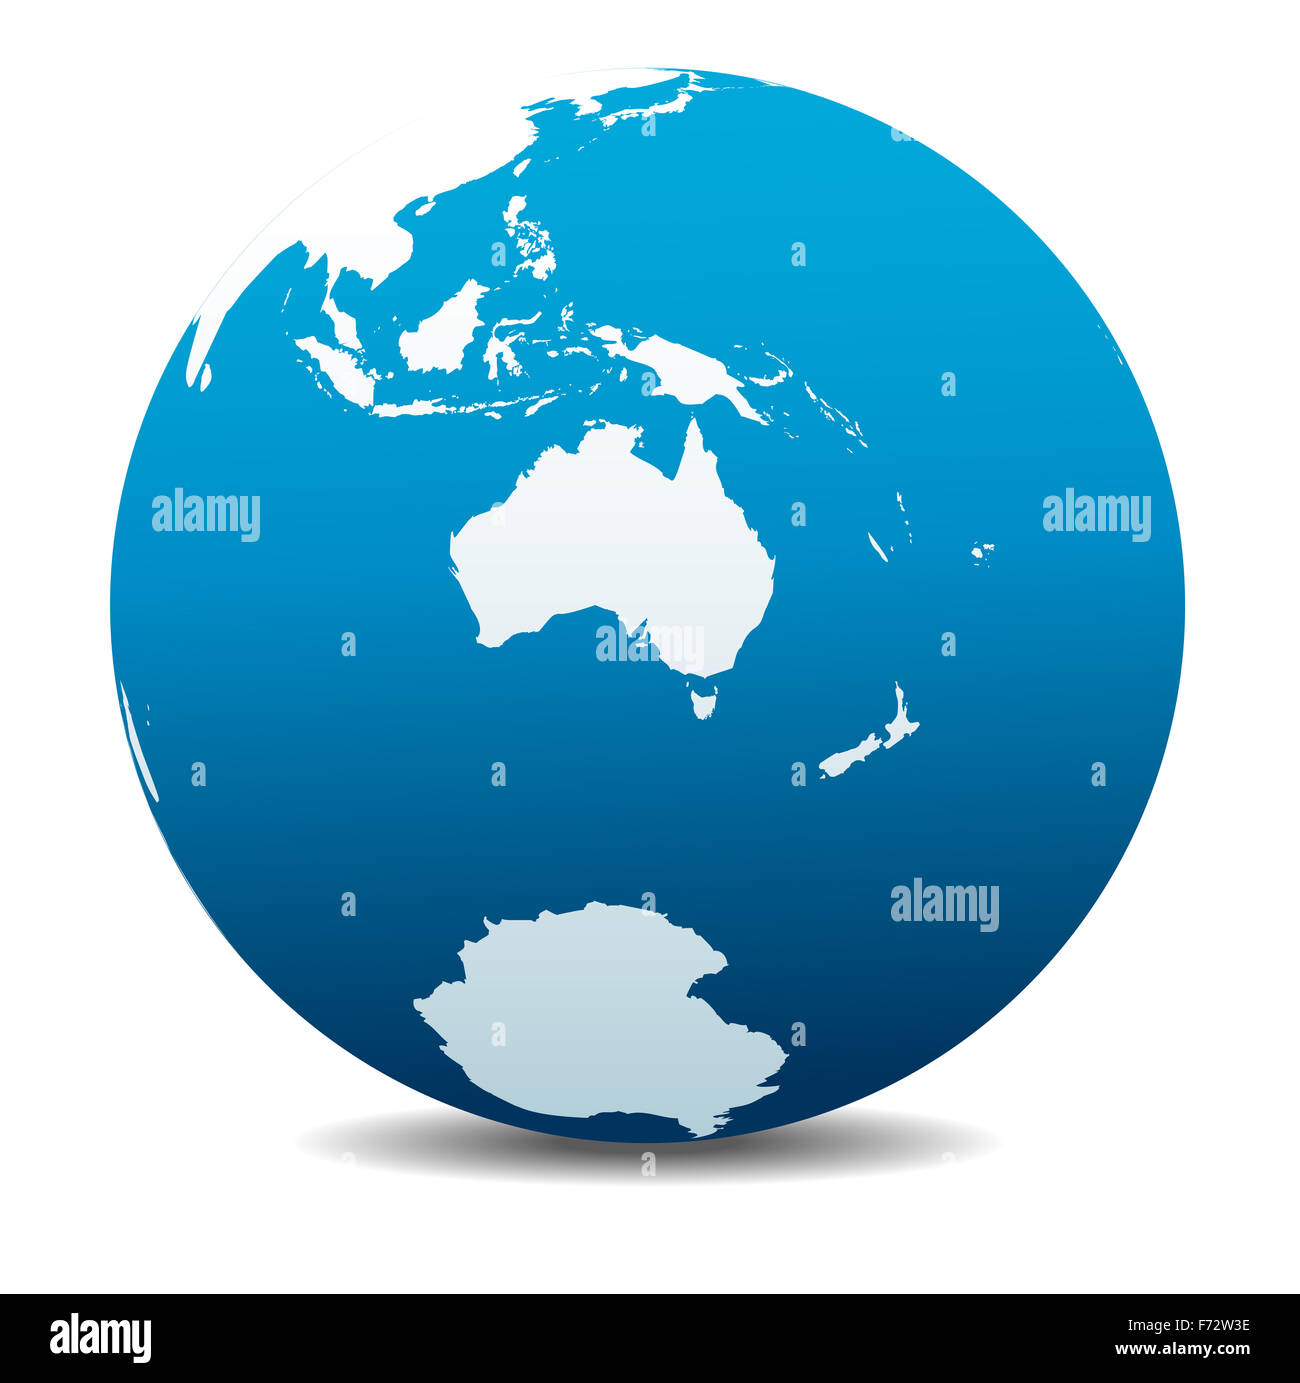 Australia and New Zealand, South Pole, Antarctica, Global World - Stock Image